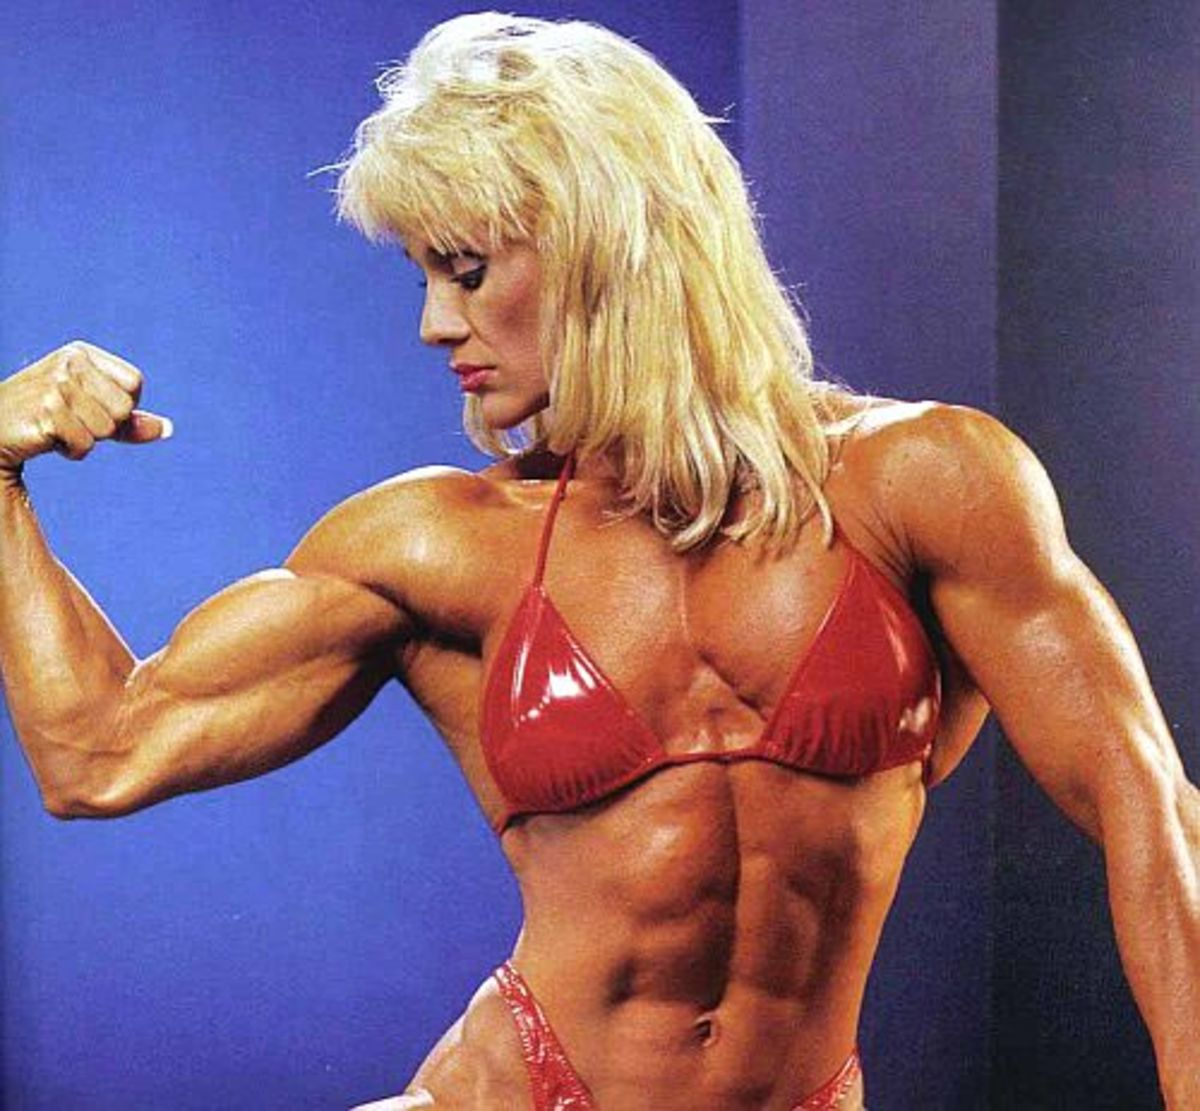 Legendary female bodybuilder Cory Everson